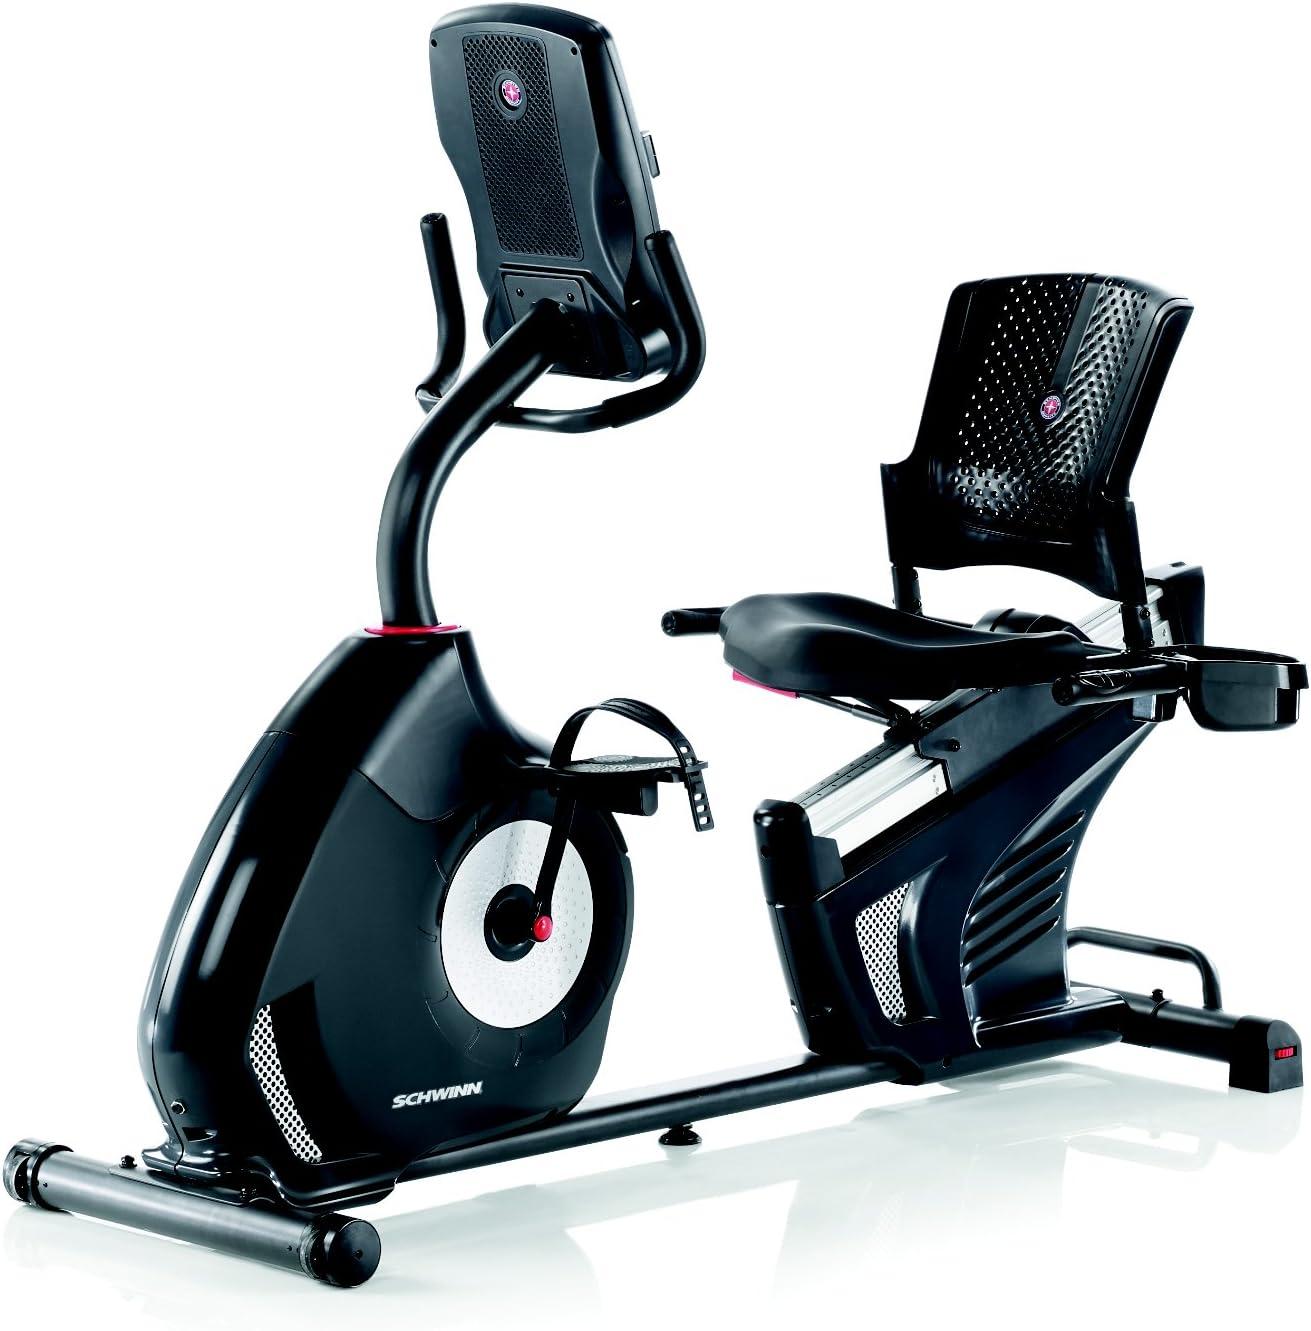 Best Overall Recumbent Exercise Bike